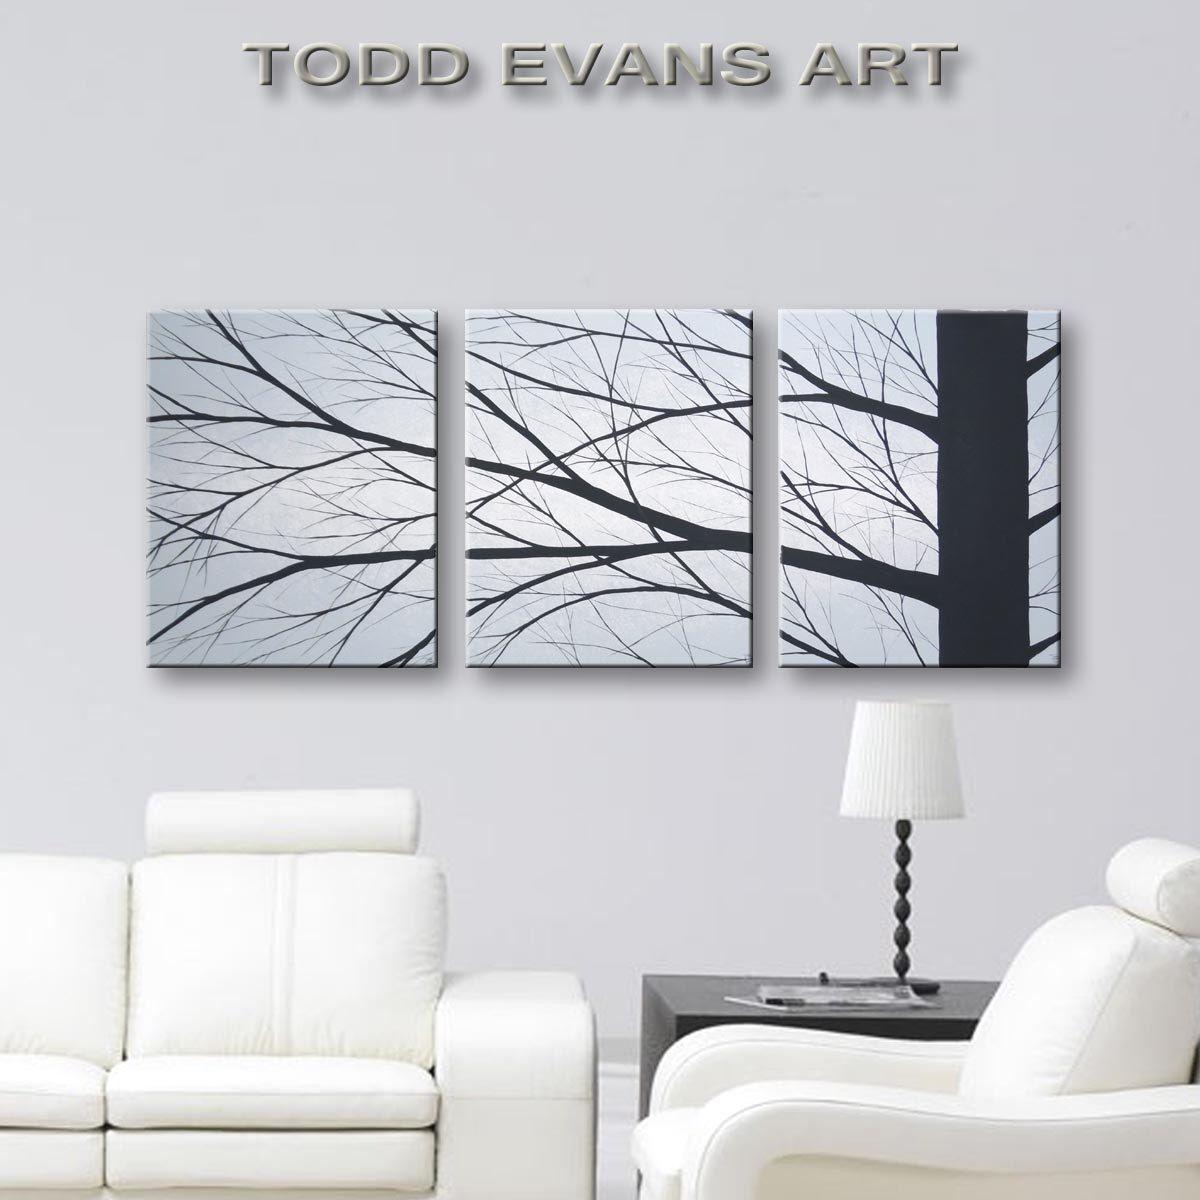 3 piece canvas art minimalist painting bedroom wall decor large wall art original painting on canvas art living room decor tree art 48x20 de toddevansart en